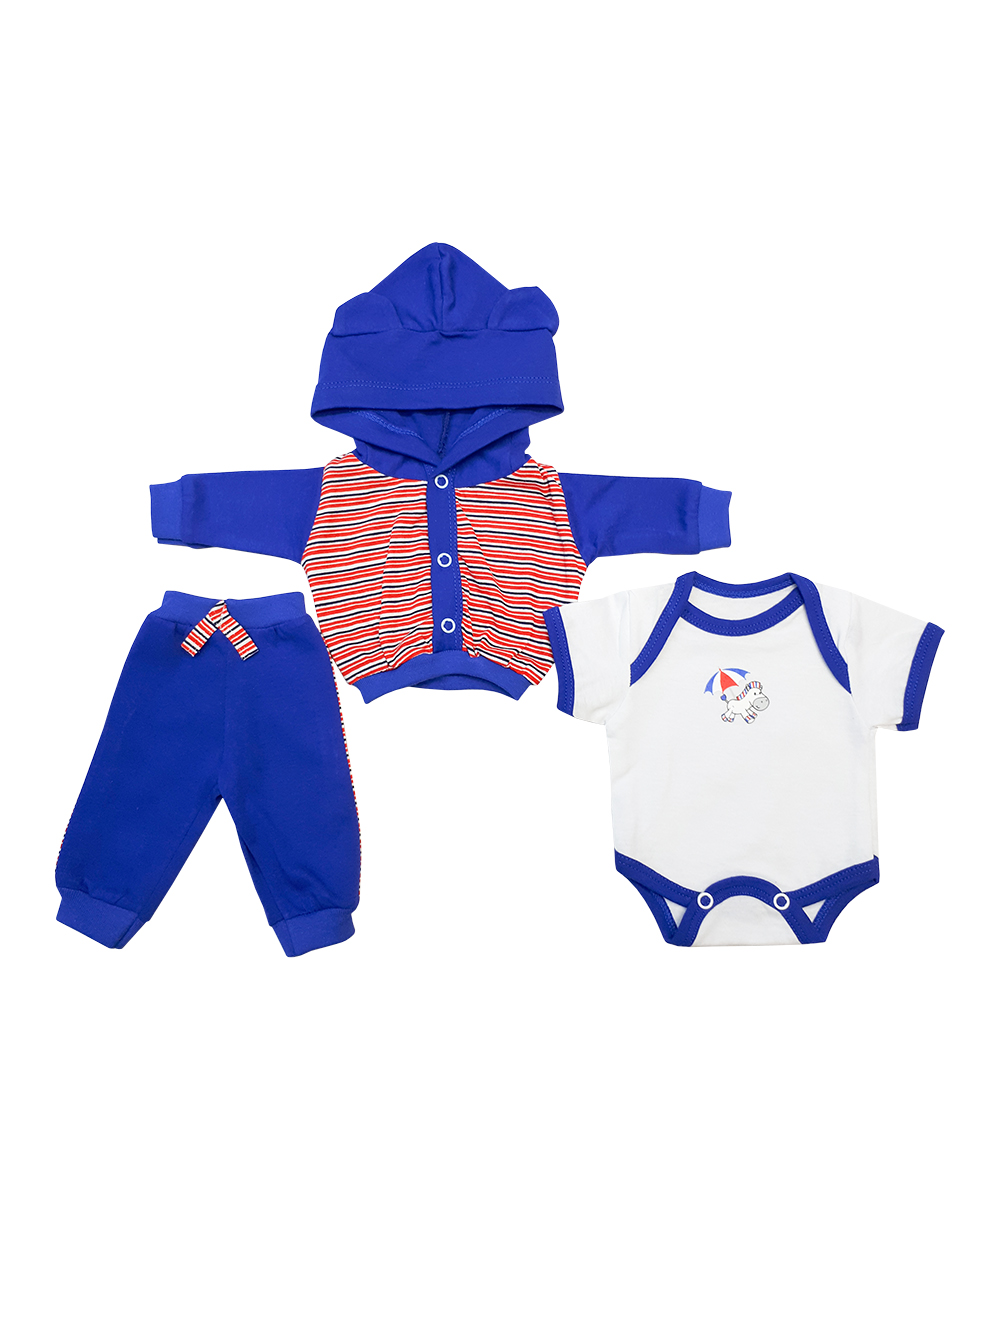 Комплект одежды для куклы Колибри синий,белый 301